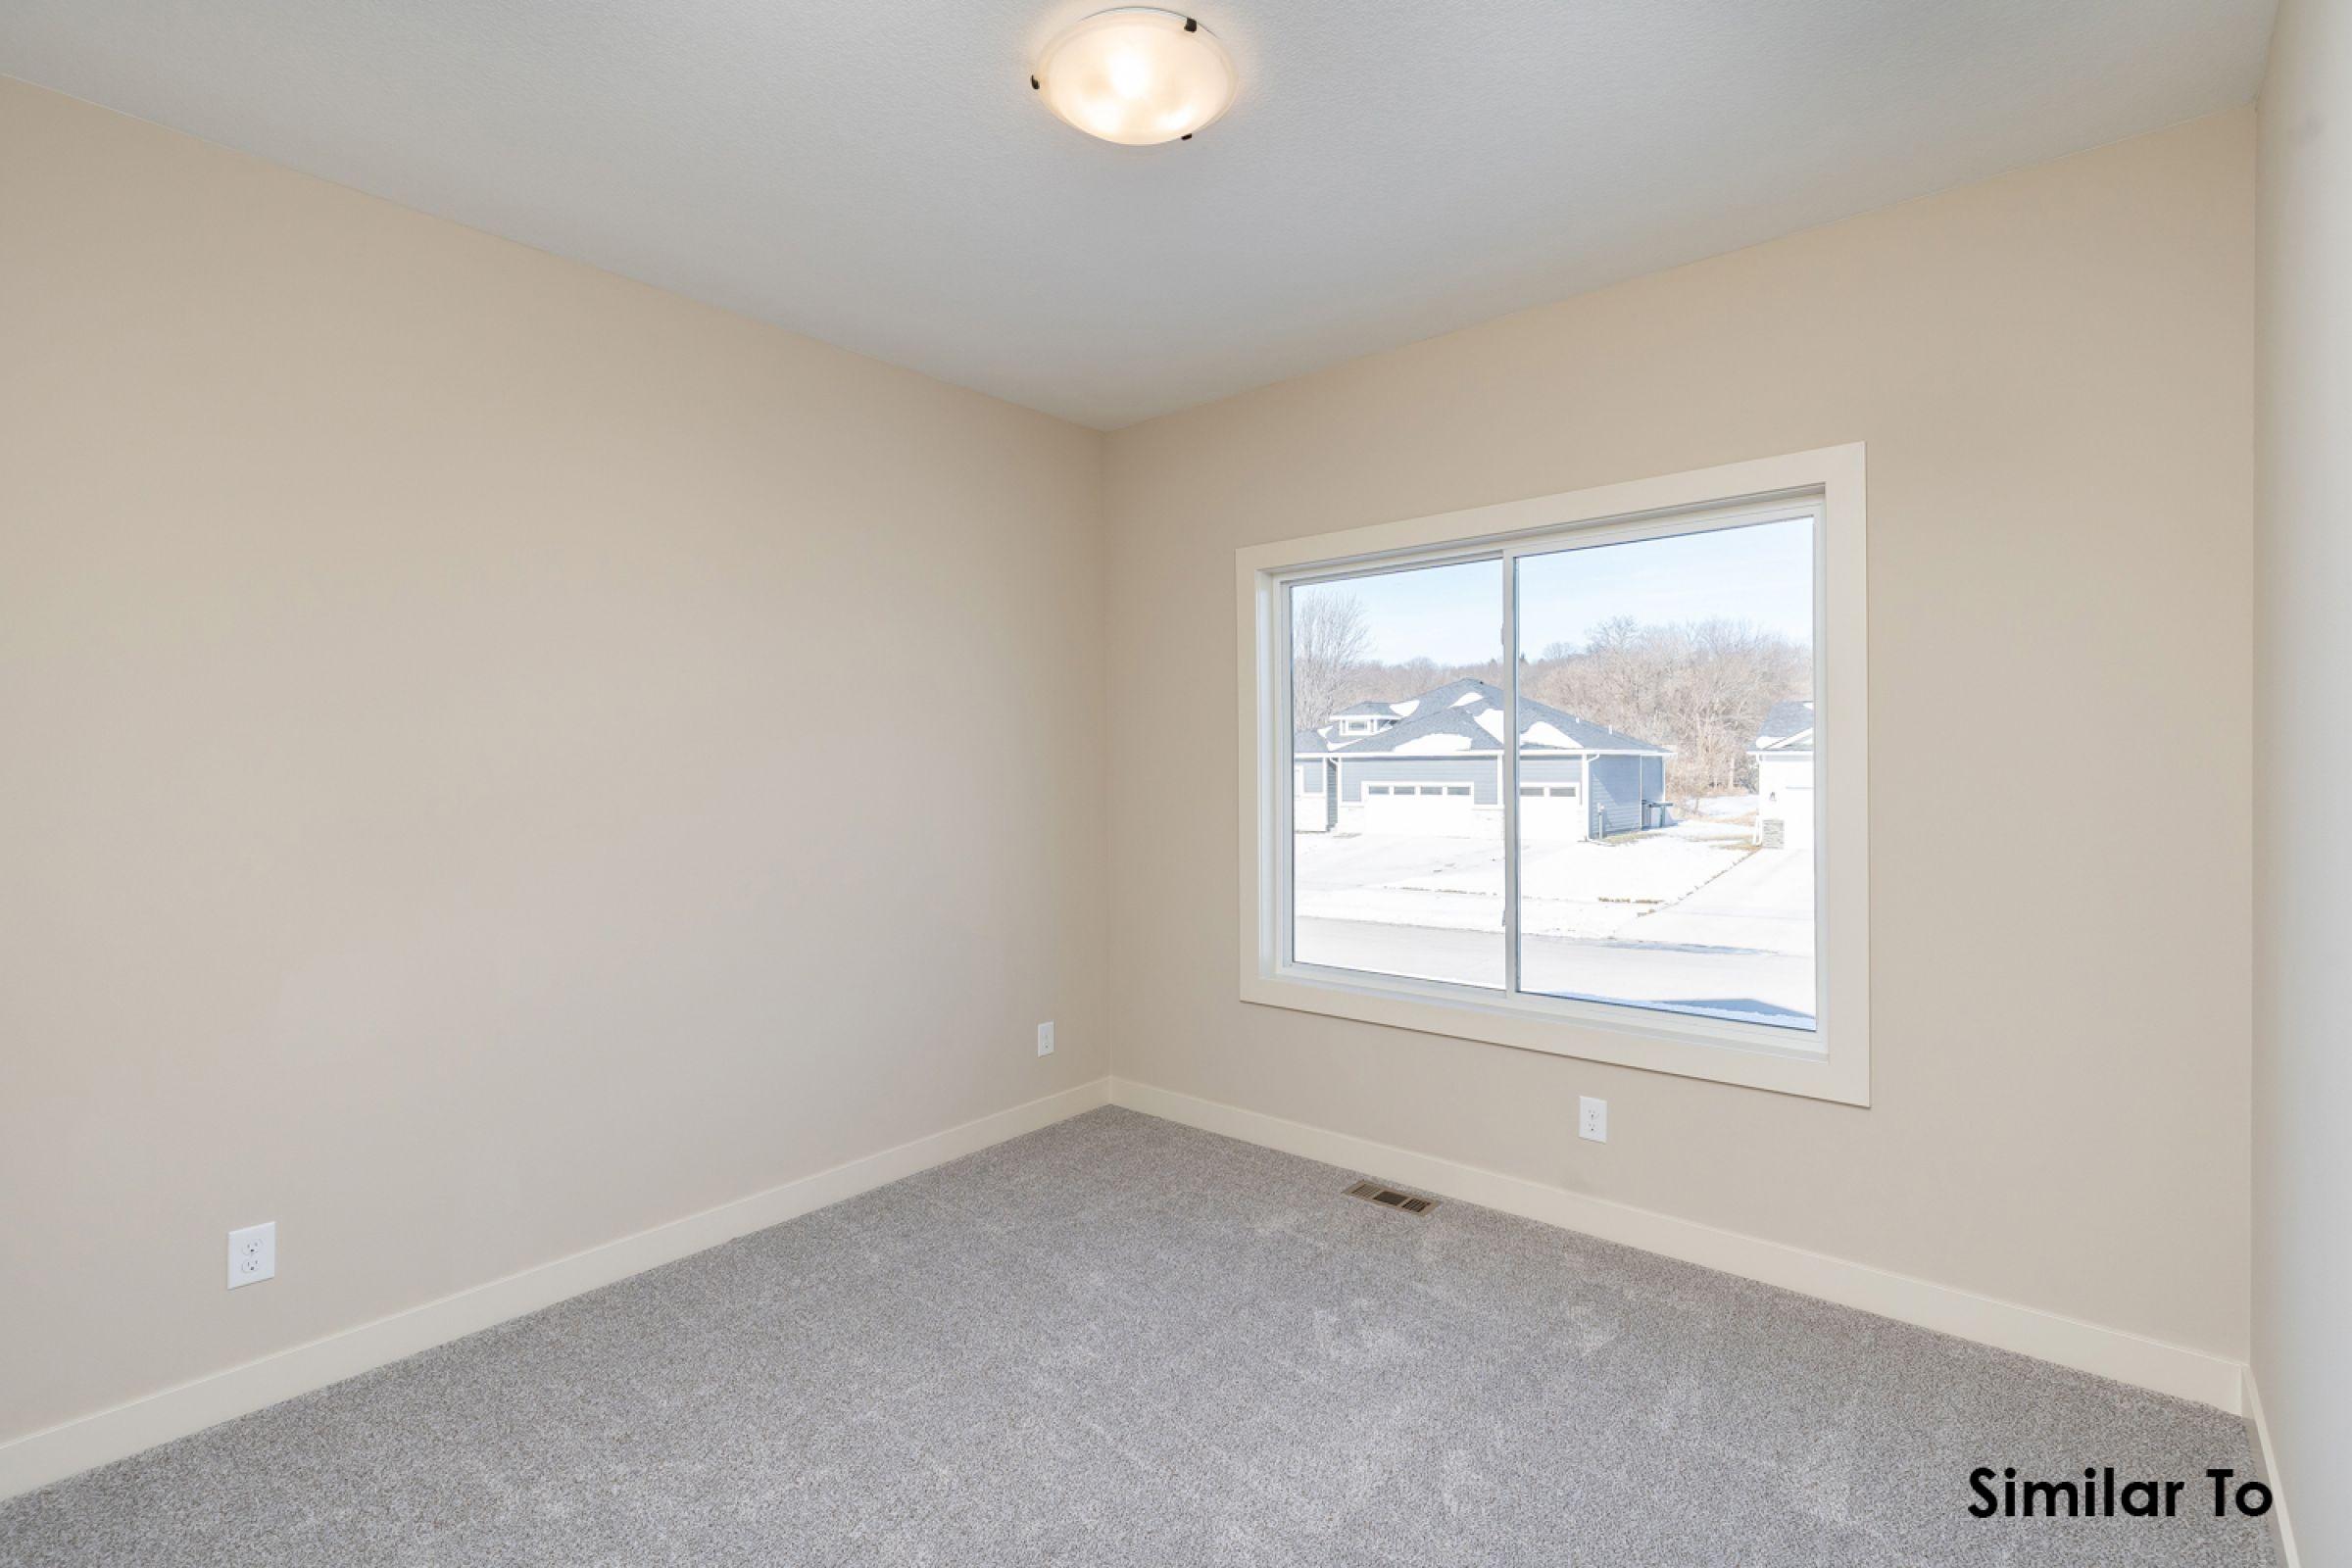 residential-warren-county-iowa-1-acres-listing-number-14995-16-2020-08-03-165354.jpg